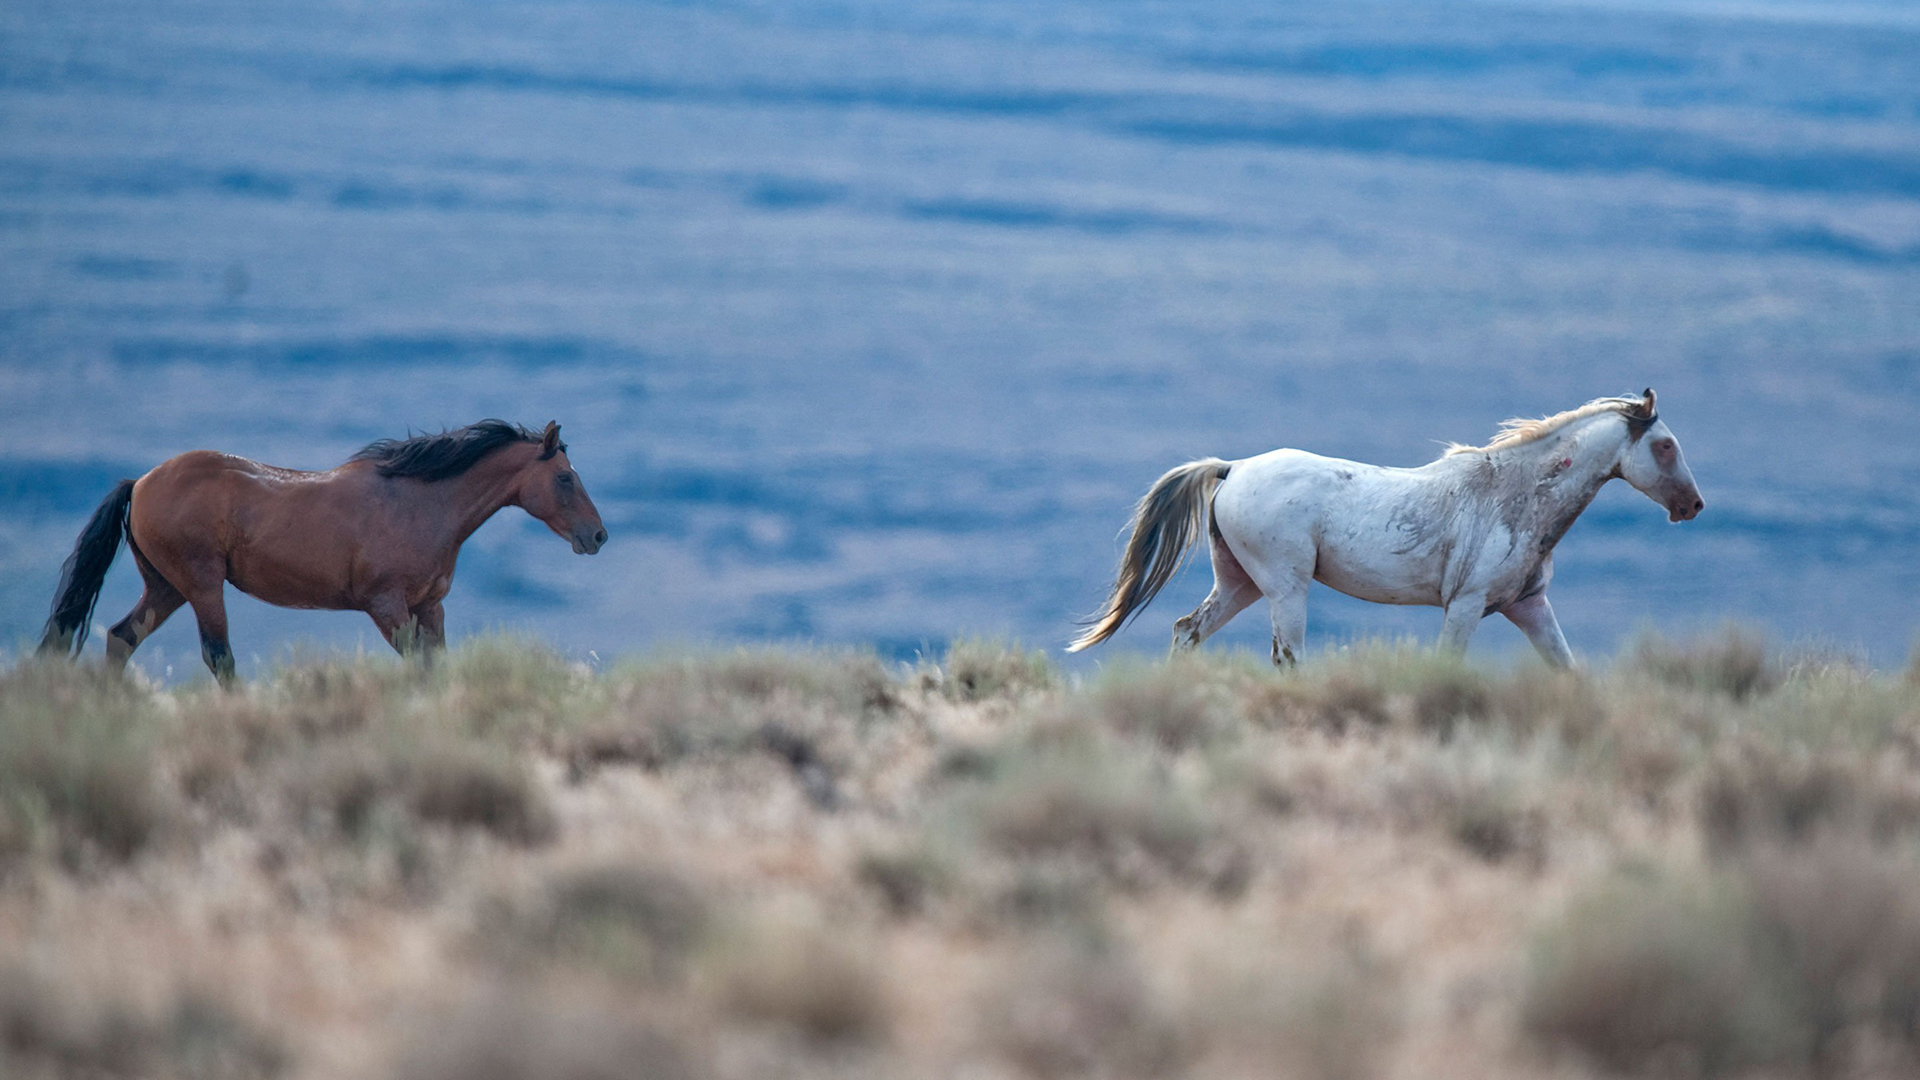 Two wild horses gallop in Lassen County near Susanville. (Credit::Hector Amezcua/Sacramento Bee/Getty Images)